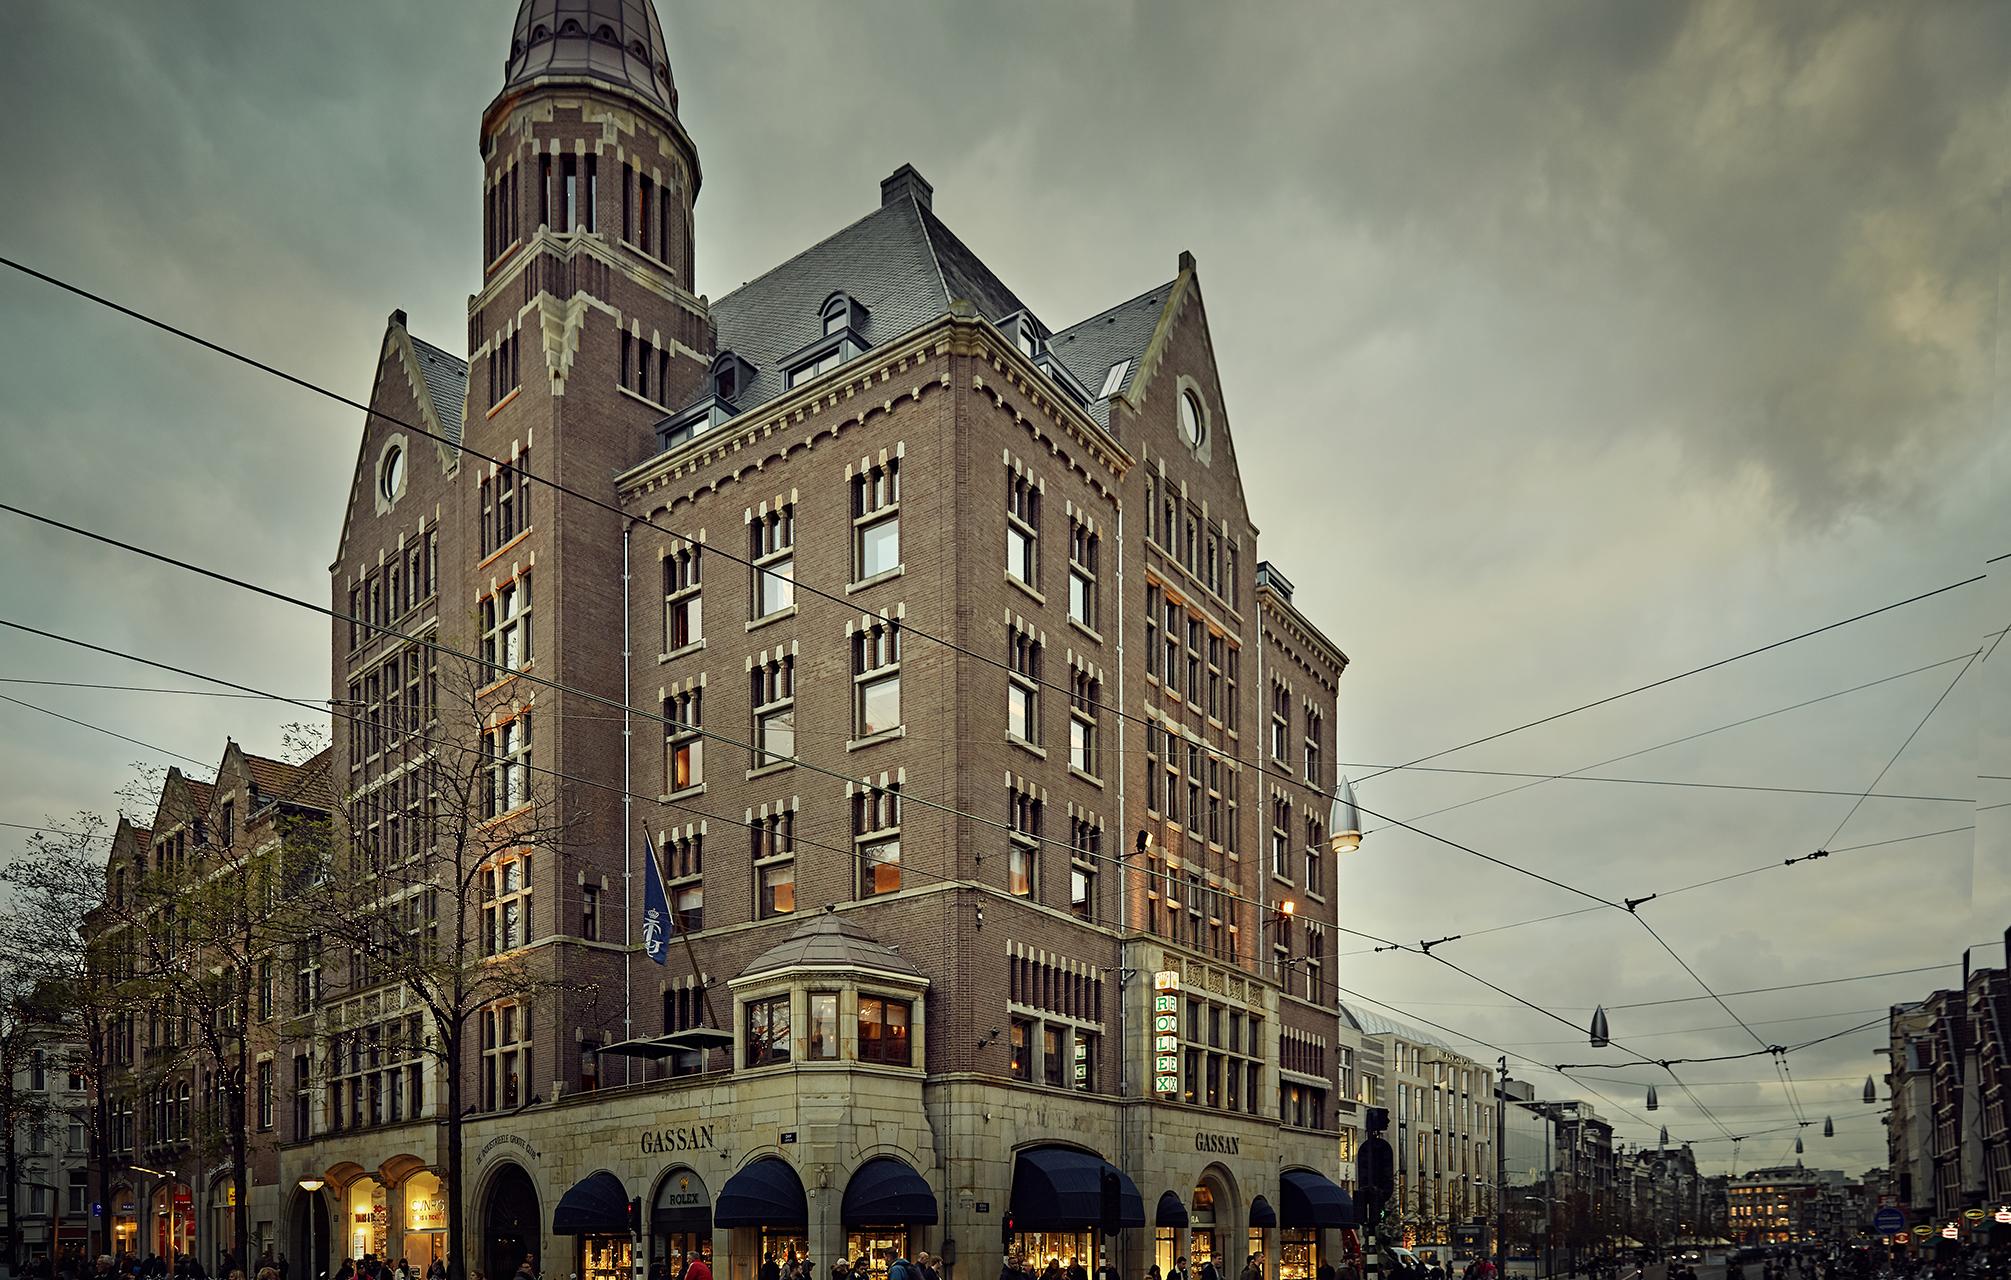 TWENTY SEVEN HOTEL